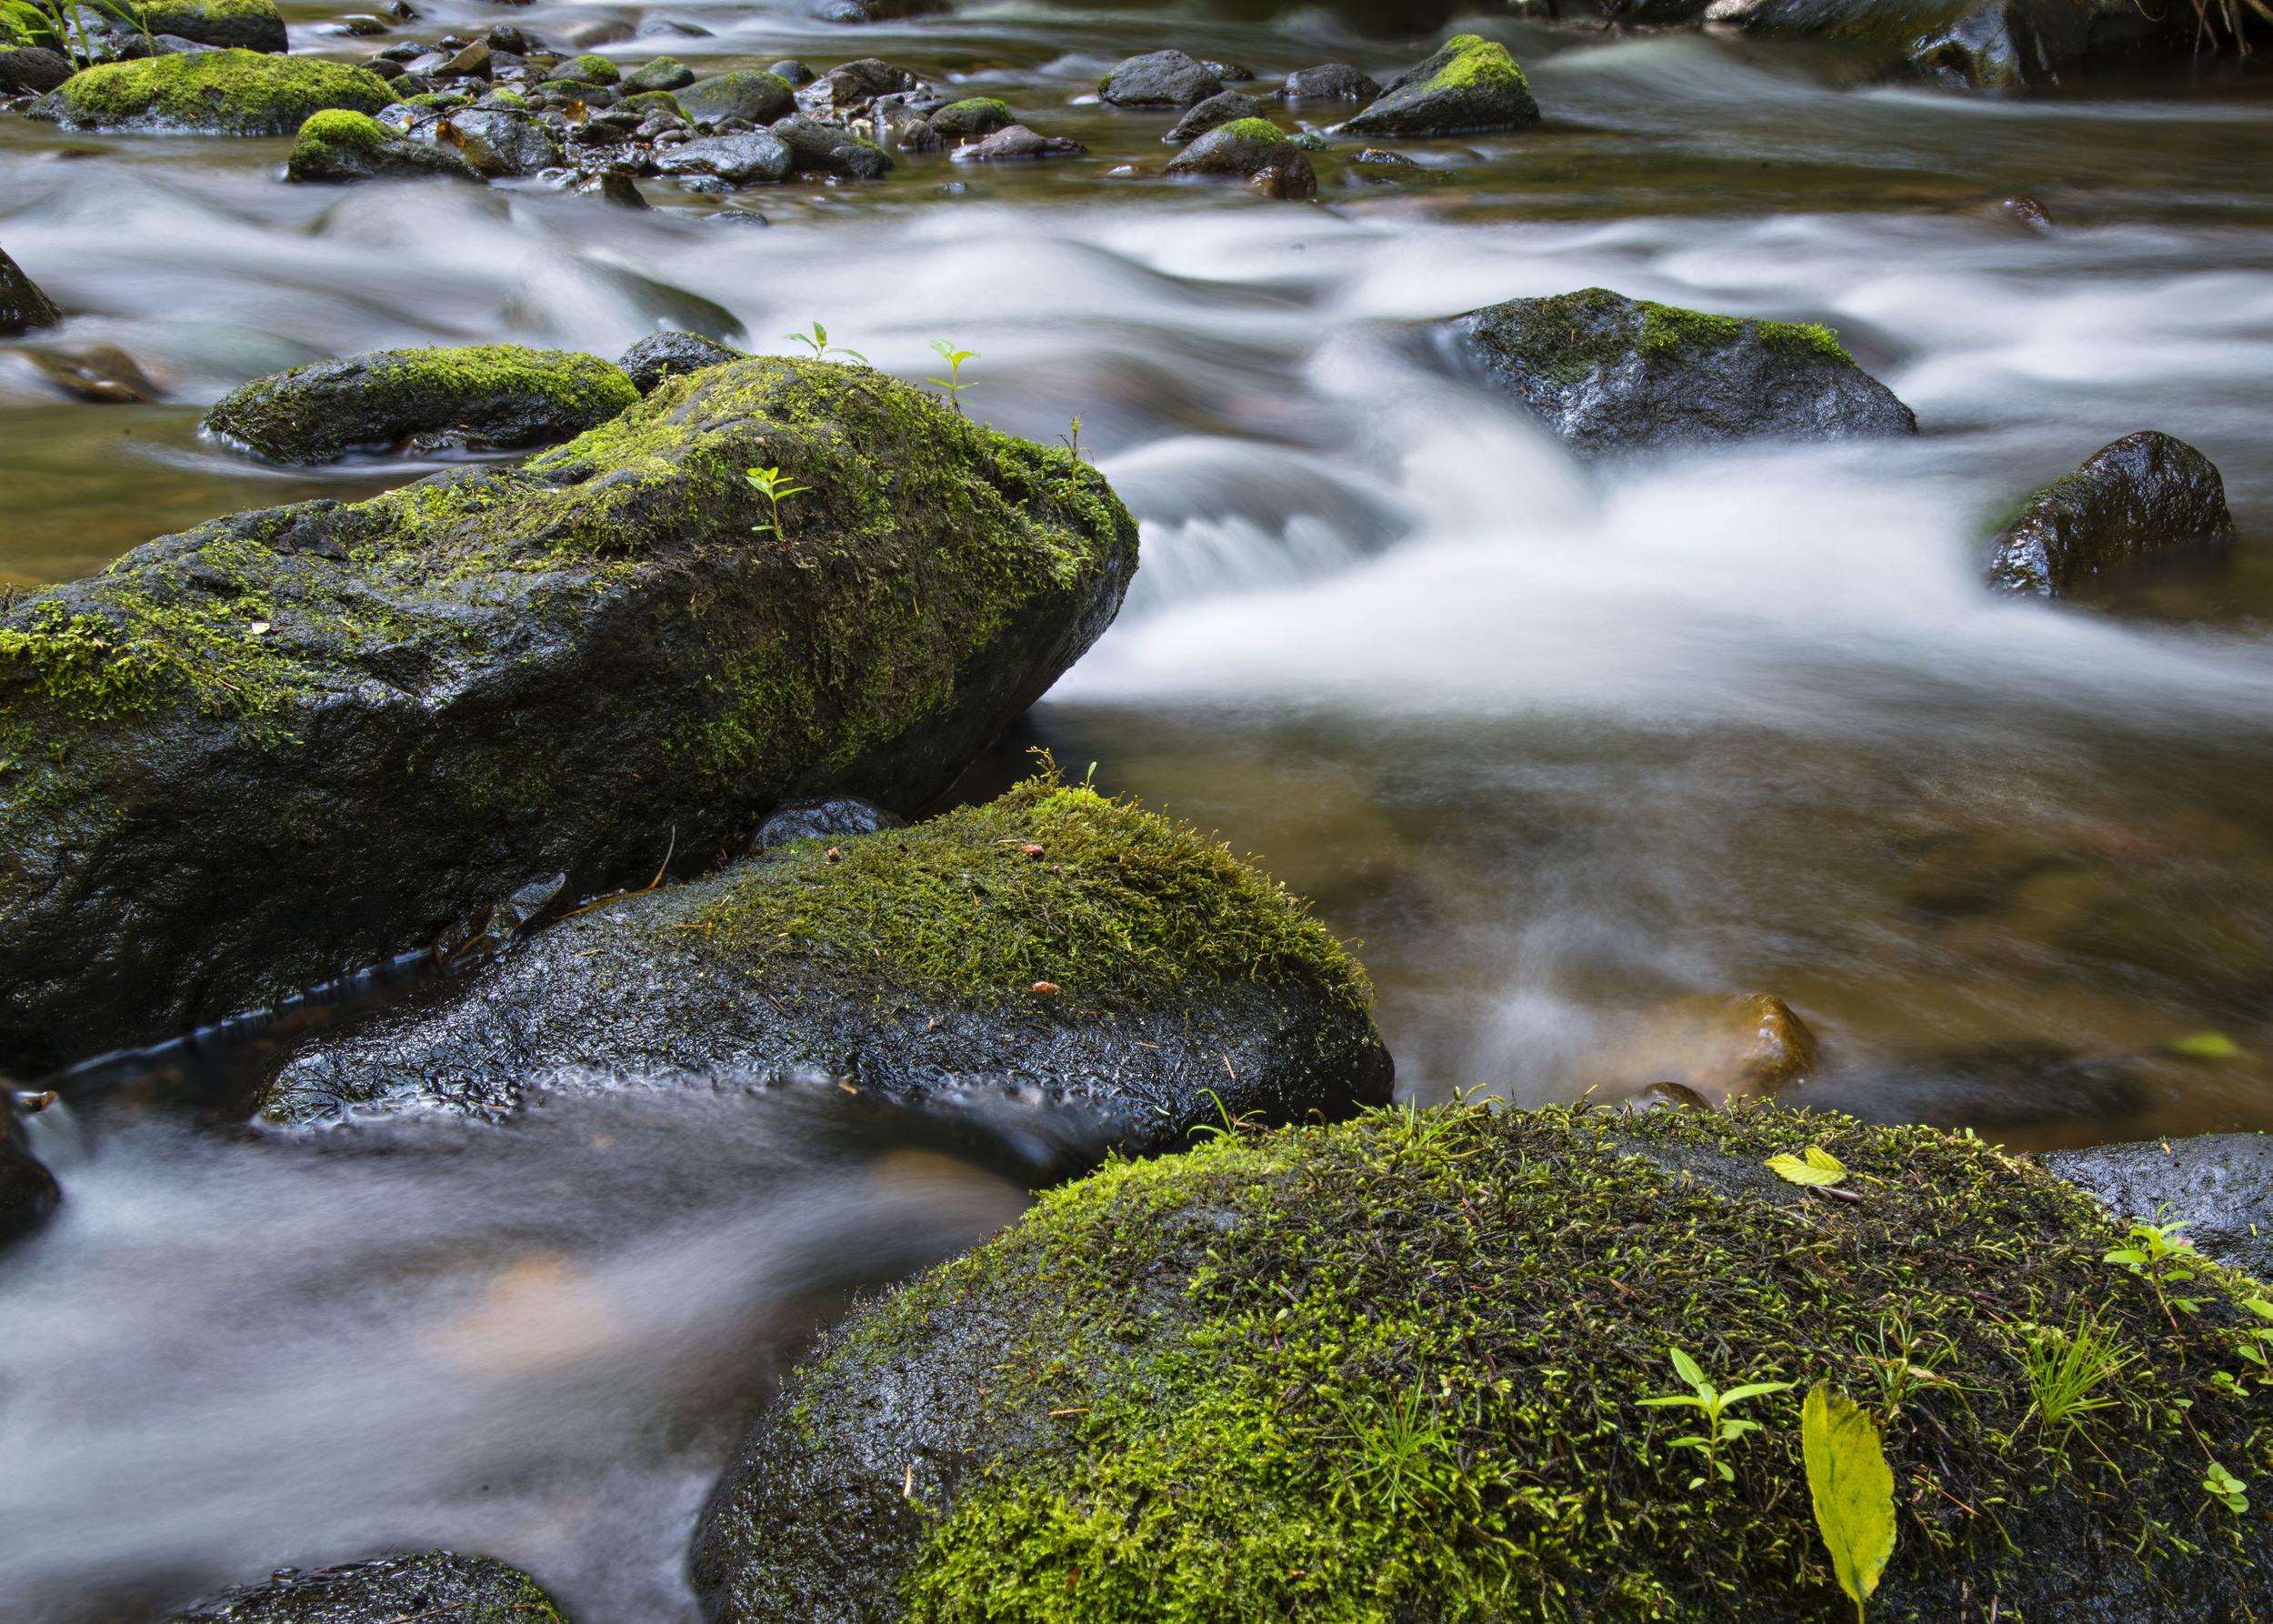 Stream and rocks at Mt. Hood. Nikon D800, Nikkor 24-120mm lens @ 44mm, f22, ISO 50, 4 sec, -2/3 stop exposure adjustment.